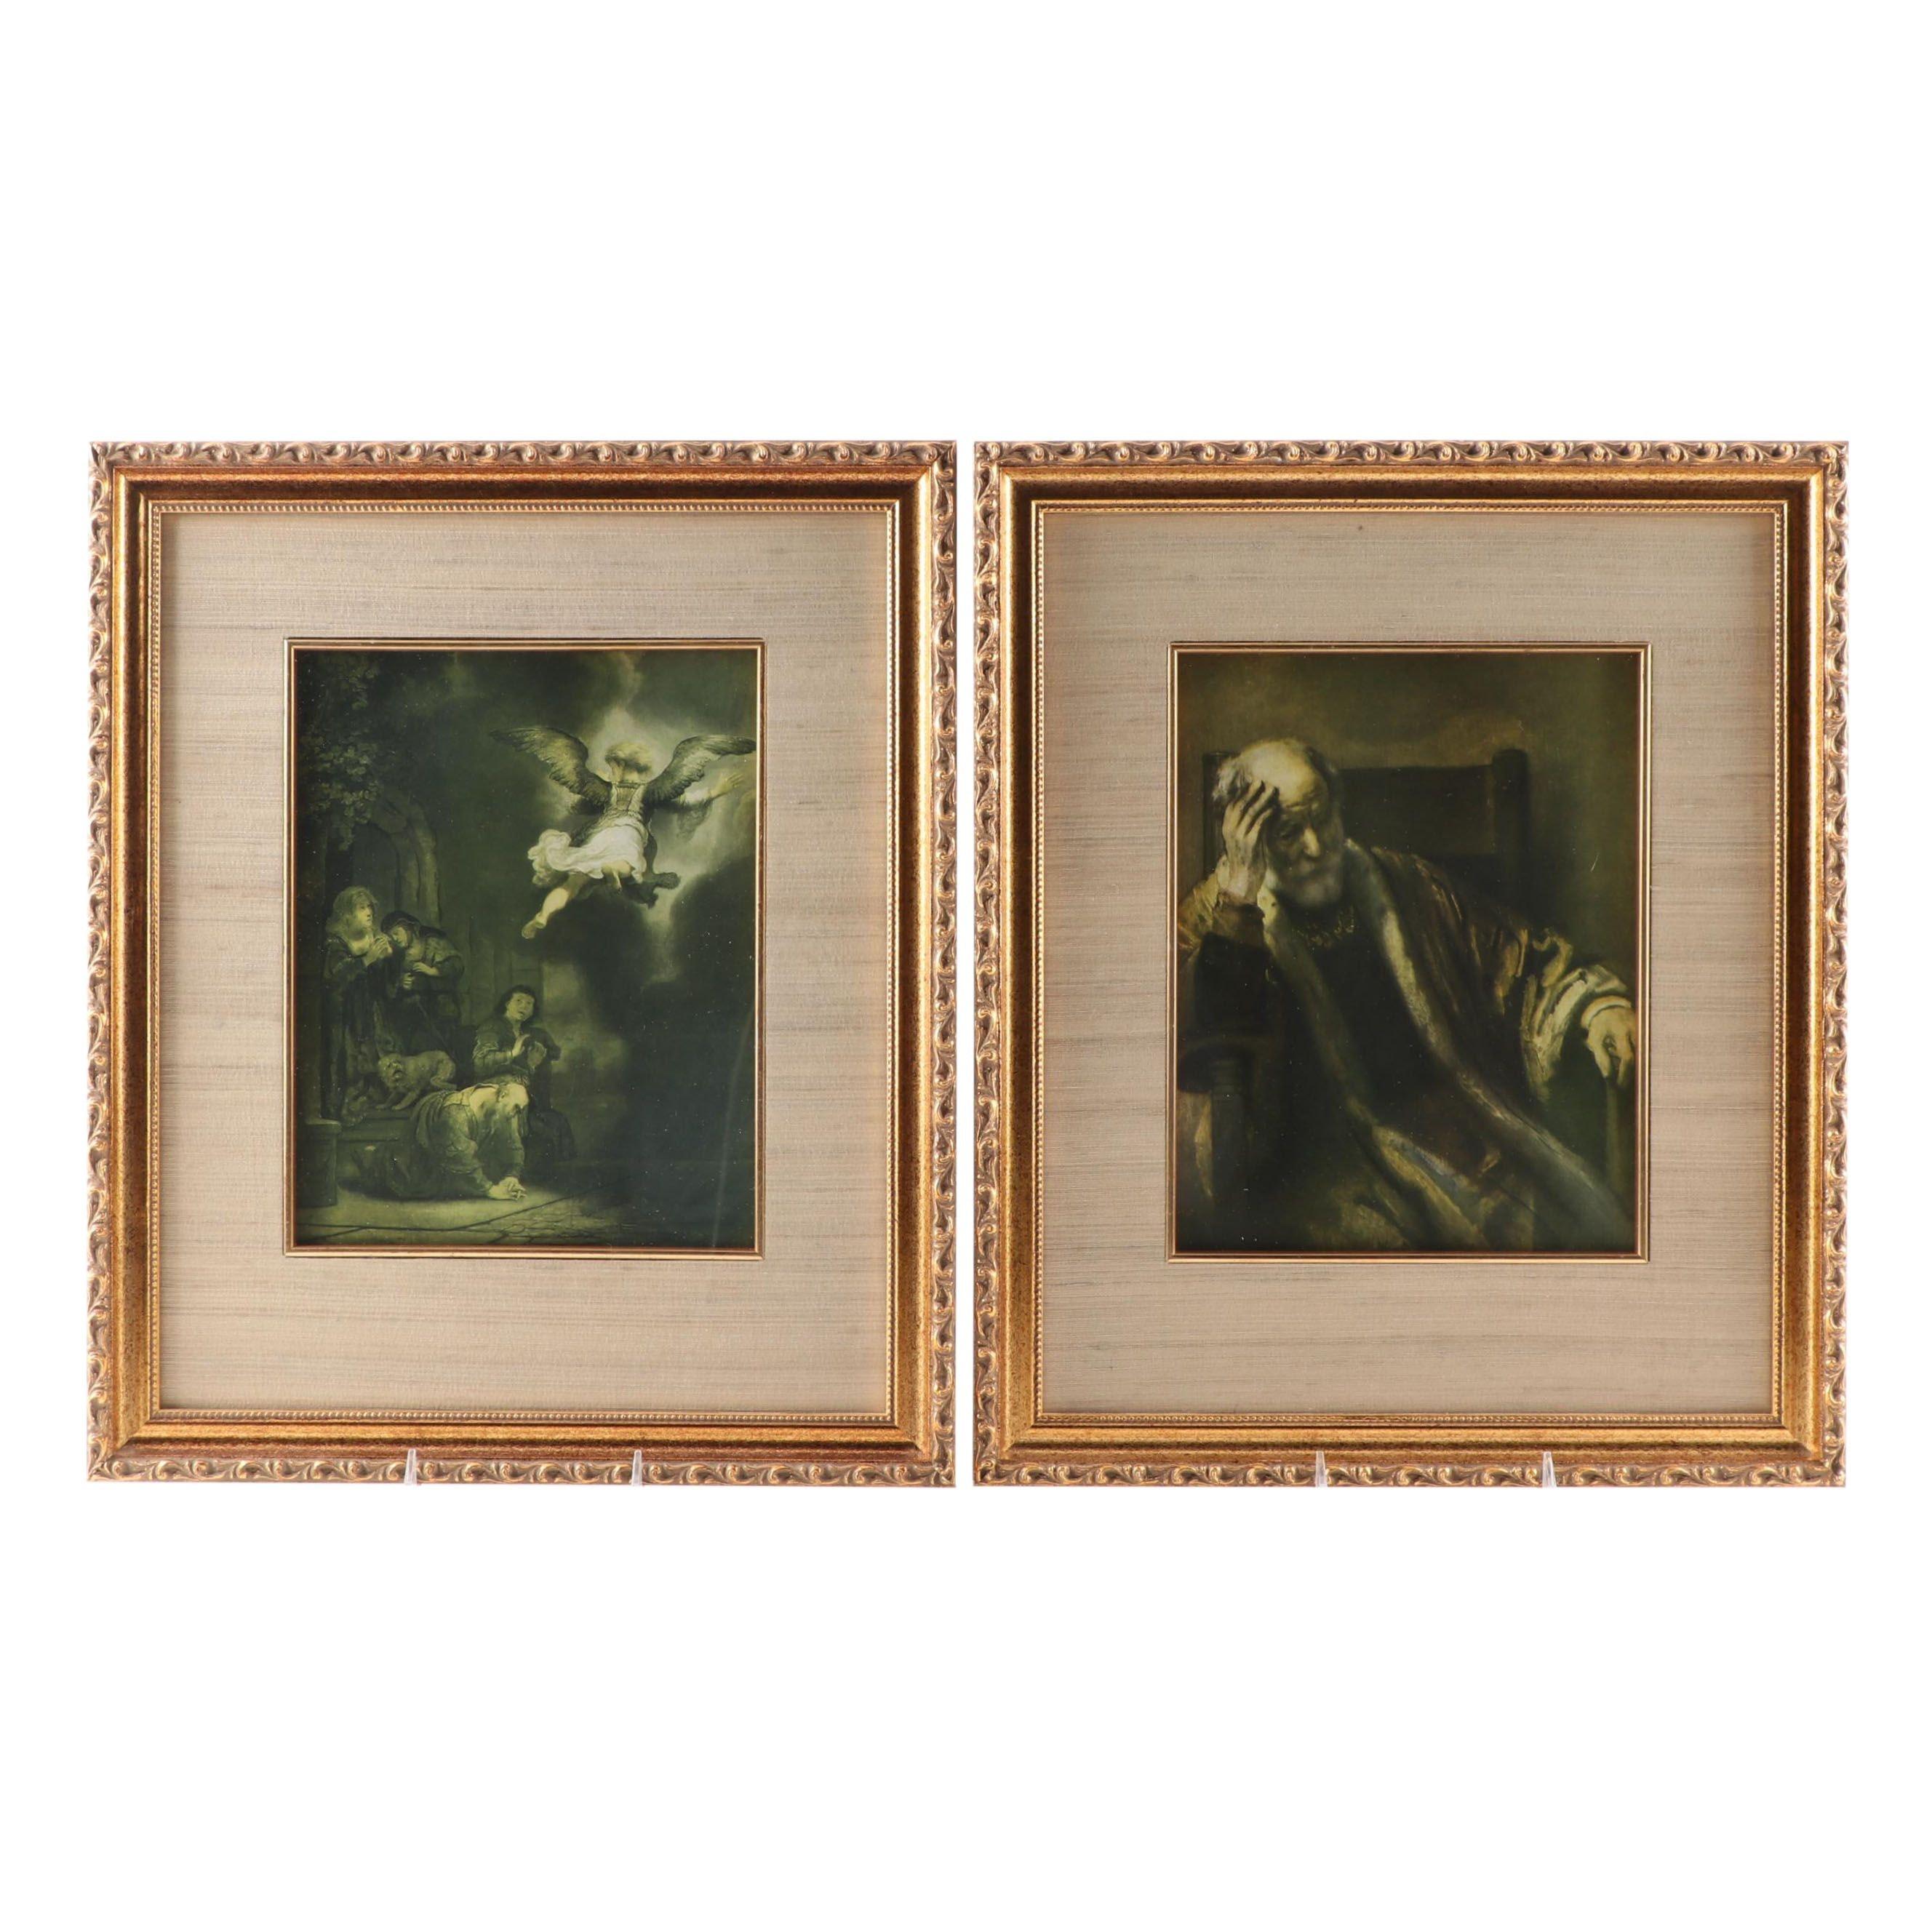 Offset Lithographs after Rembrandt